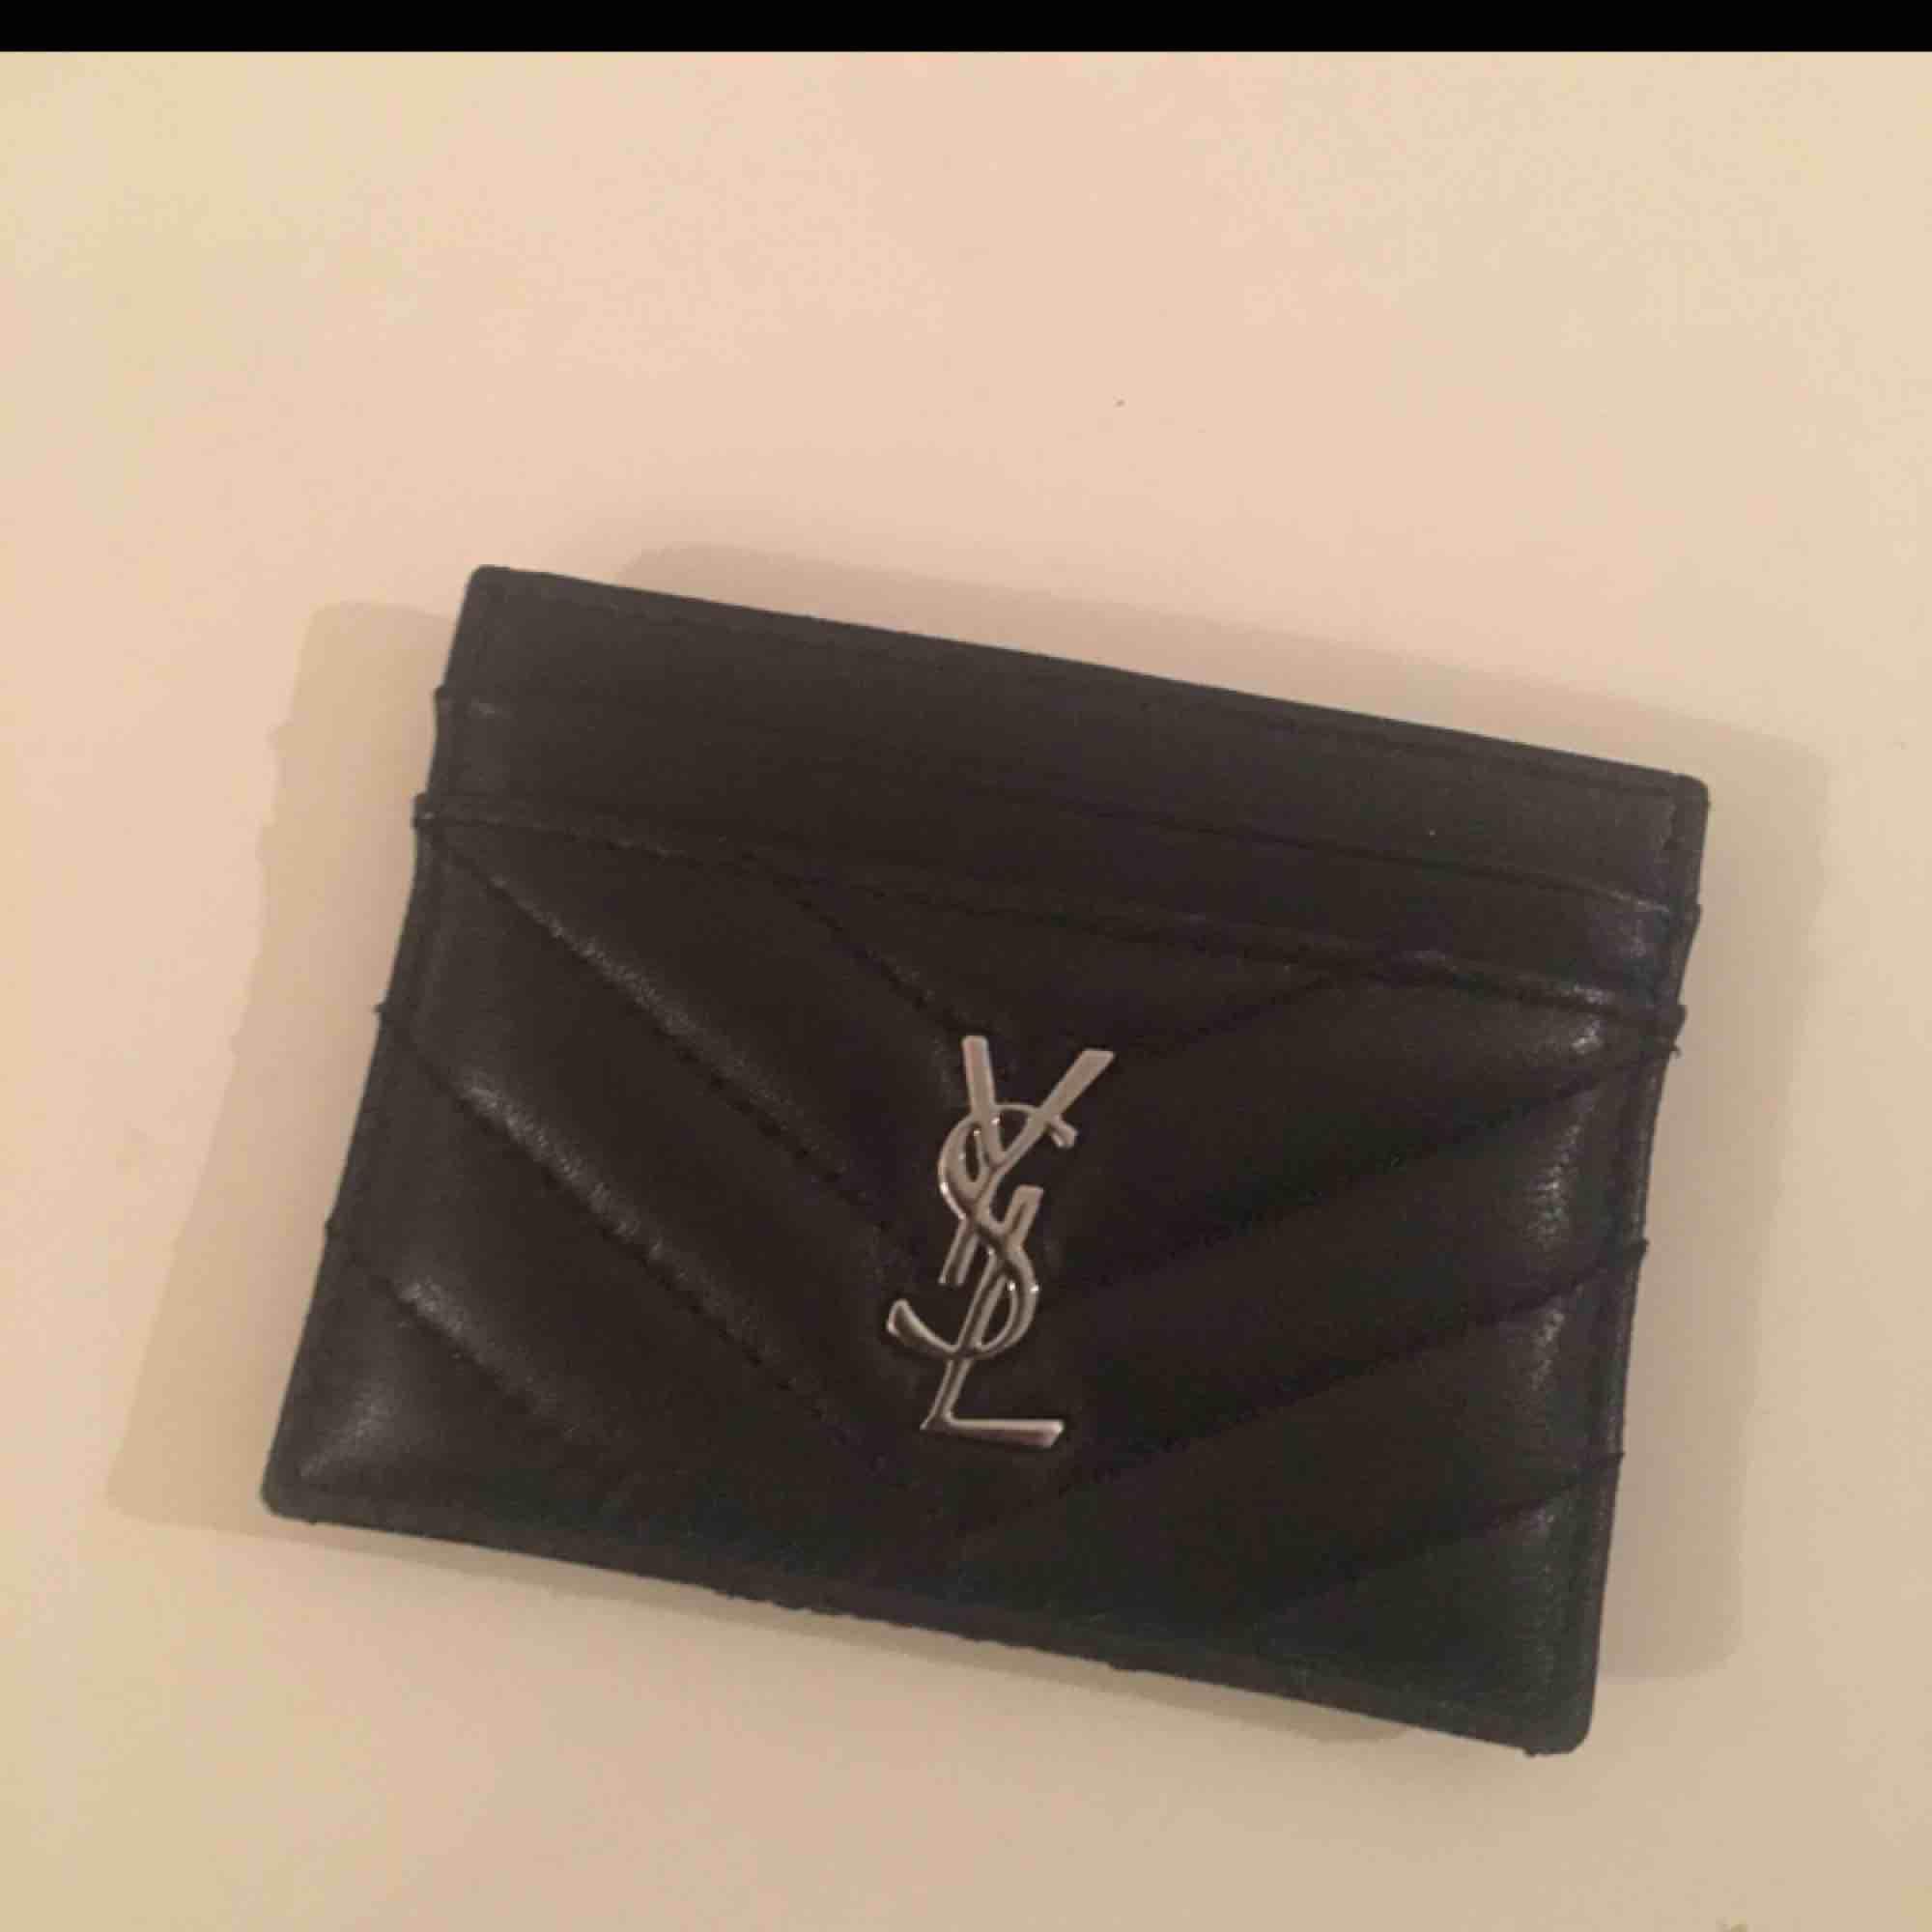 Perfekt aaa kopia med matchande plånbok. Väskor.